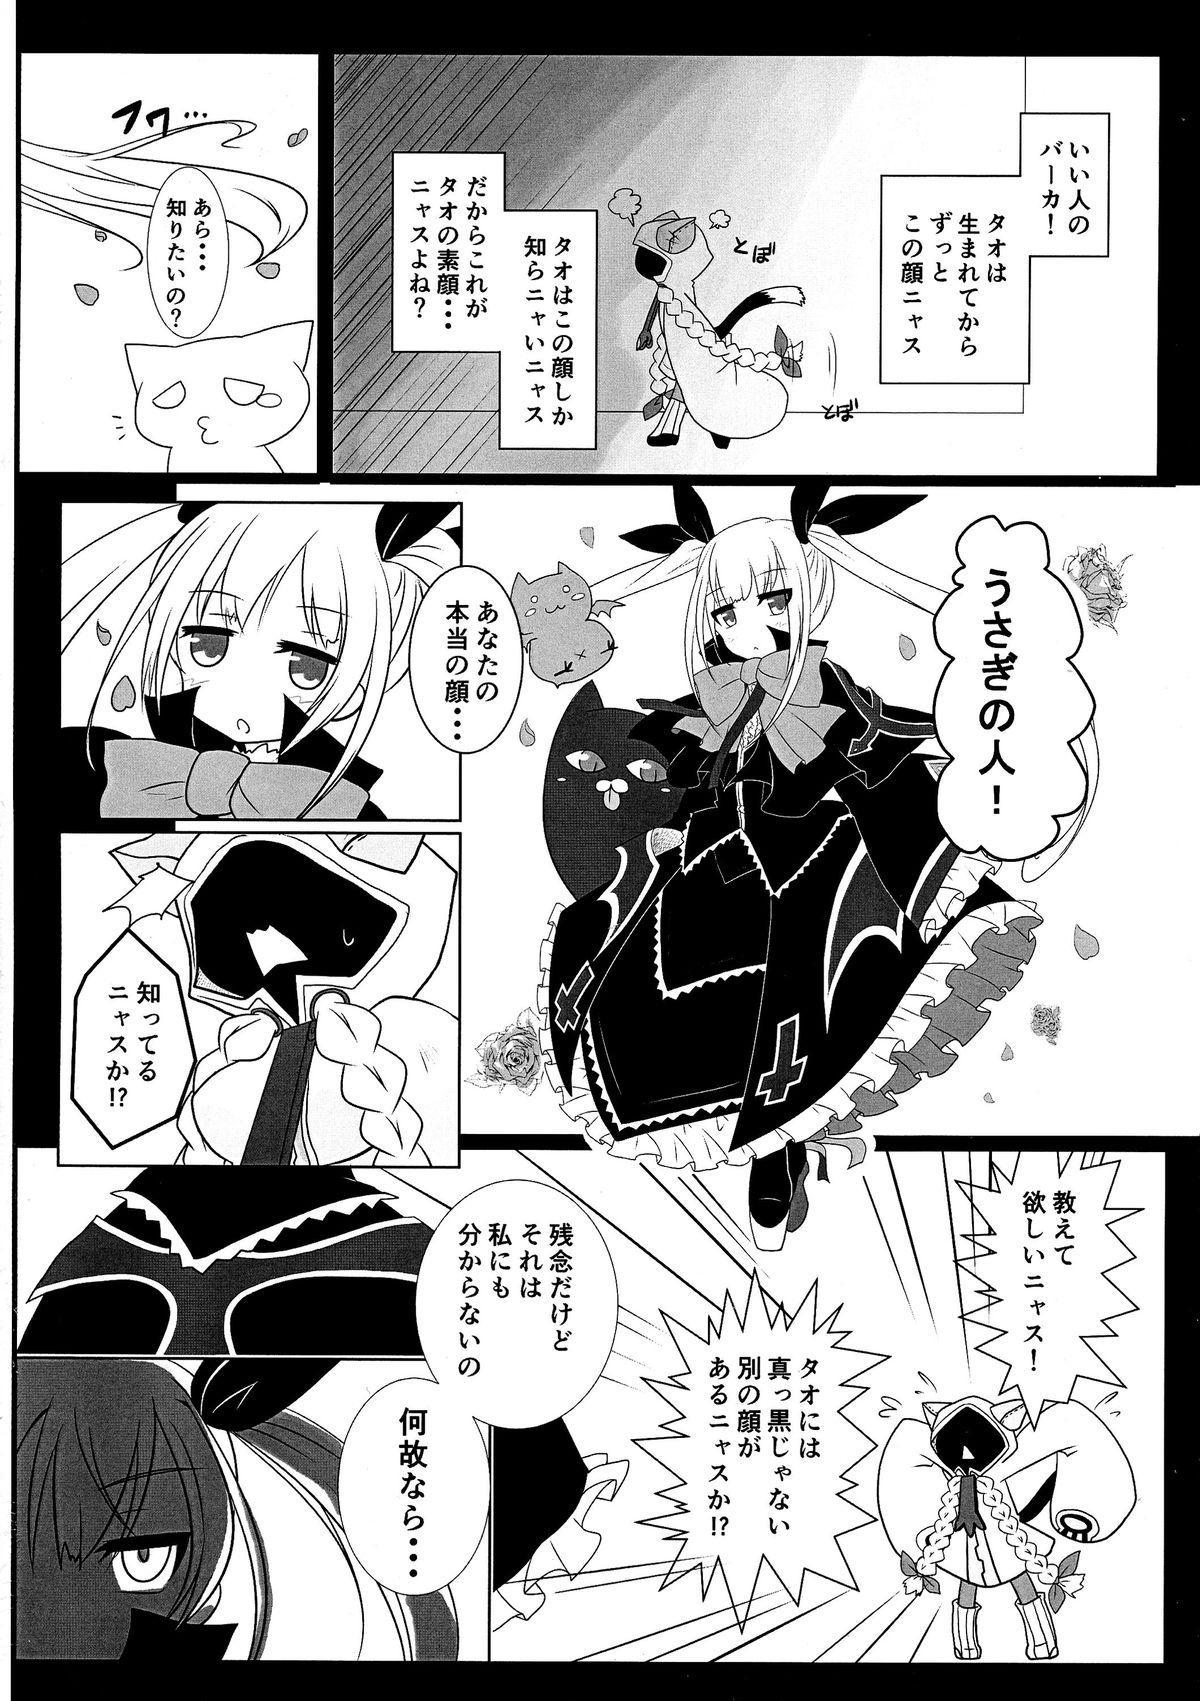 Tao no Ongaeshi 7